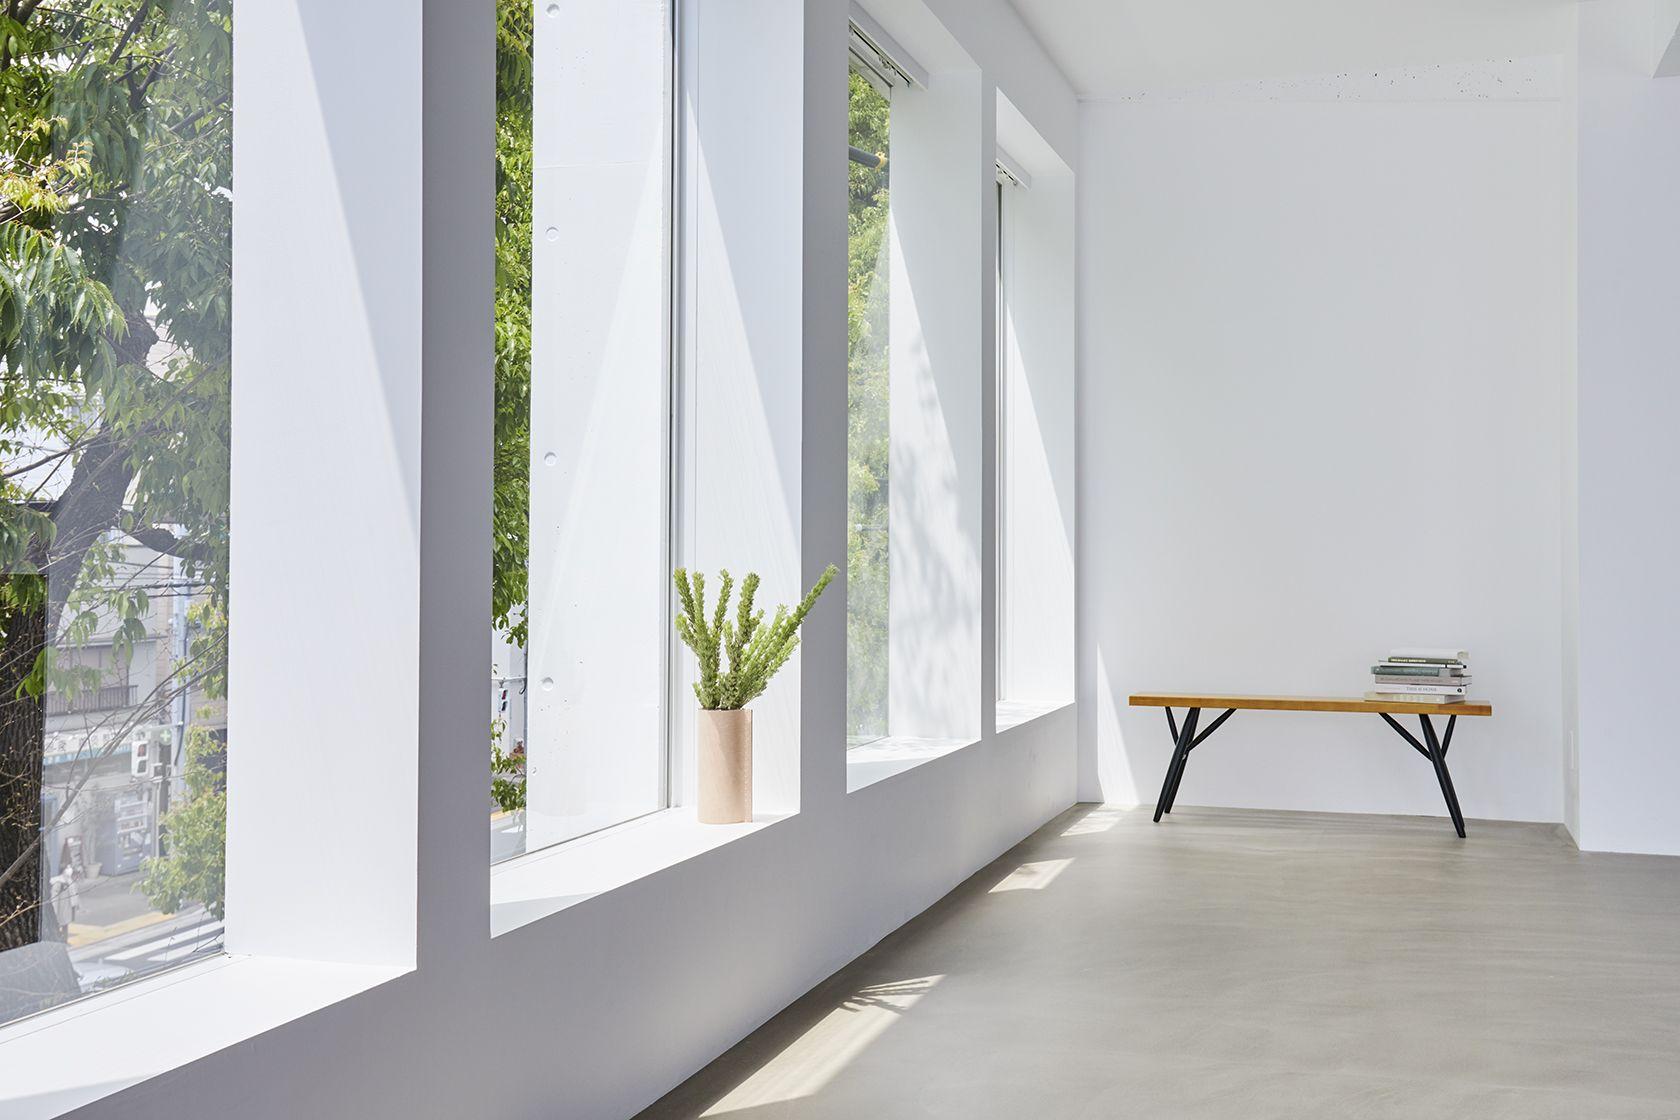 Haku Studio / SUNS日差しが差し込む窓